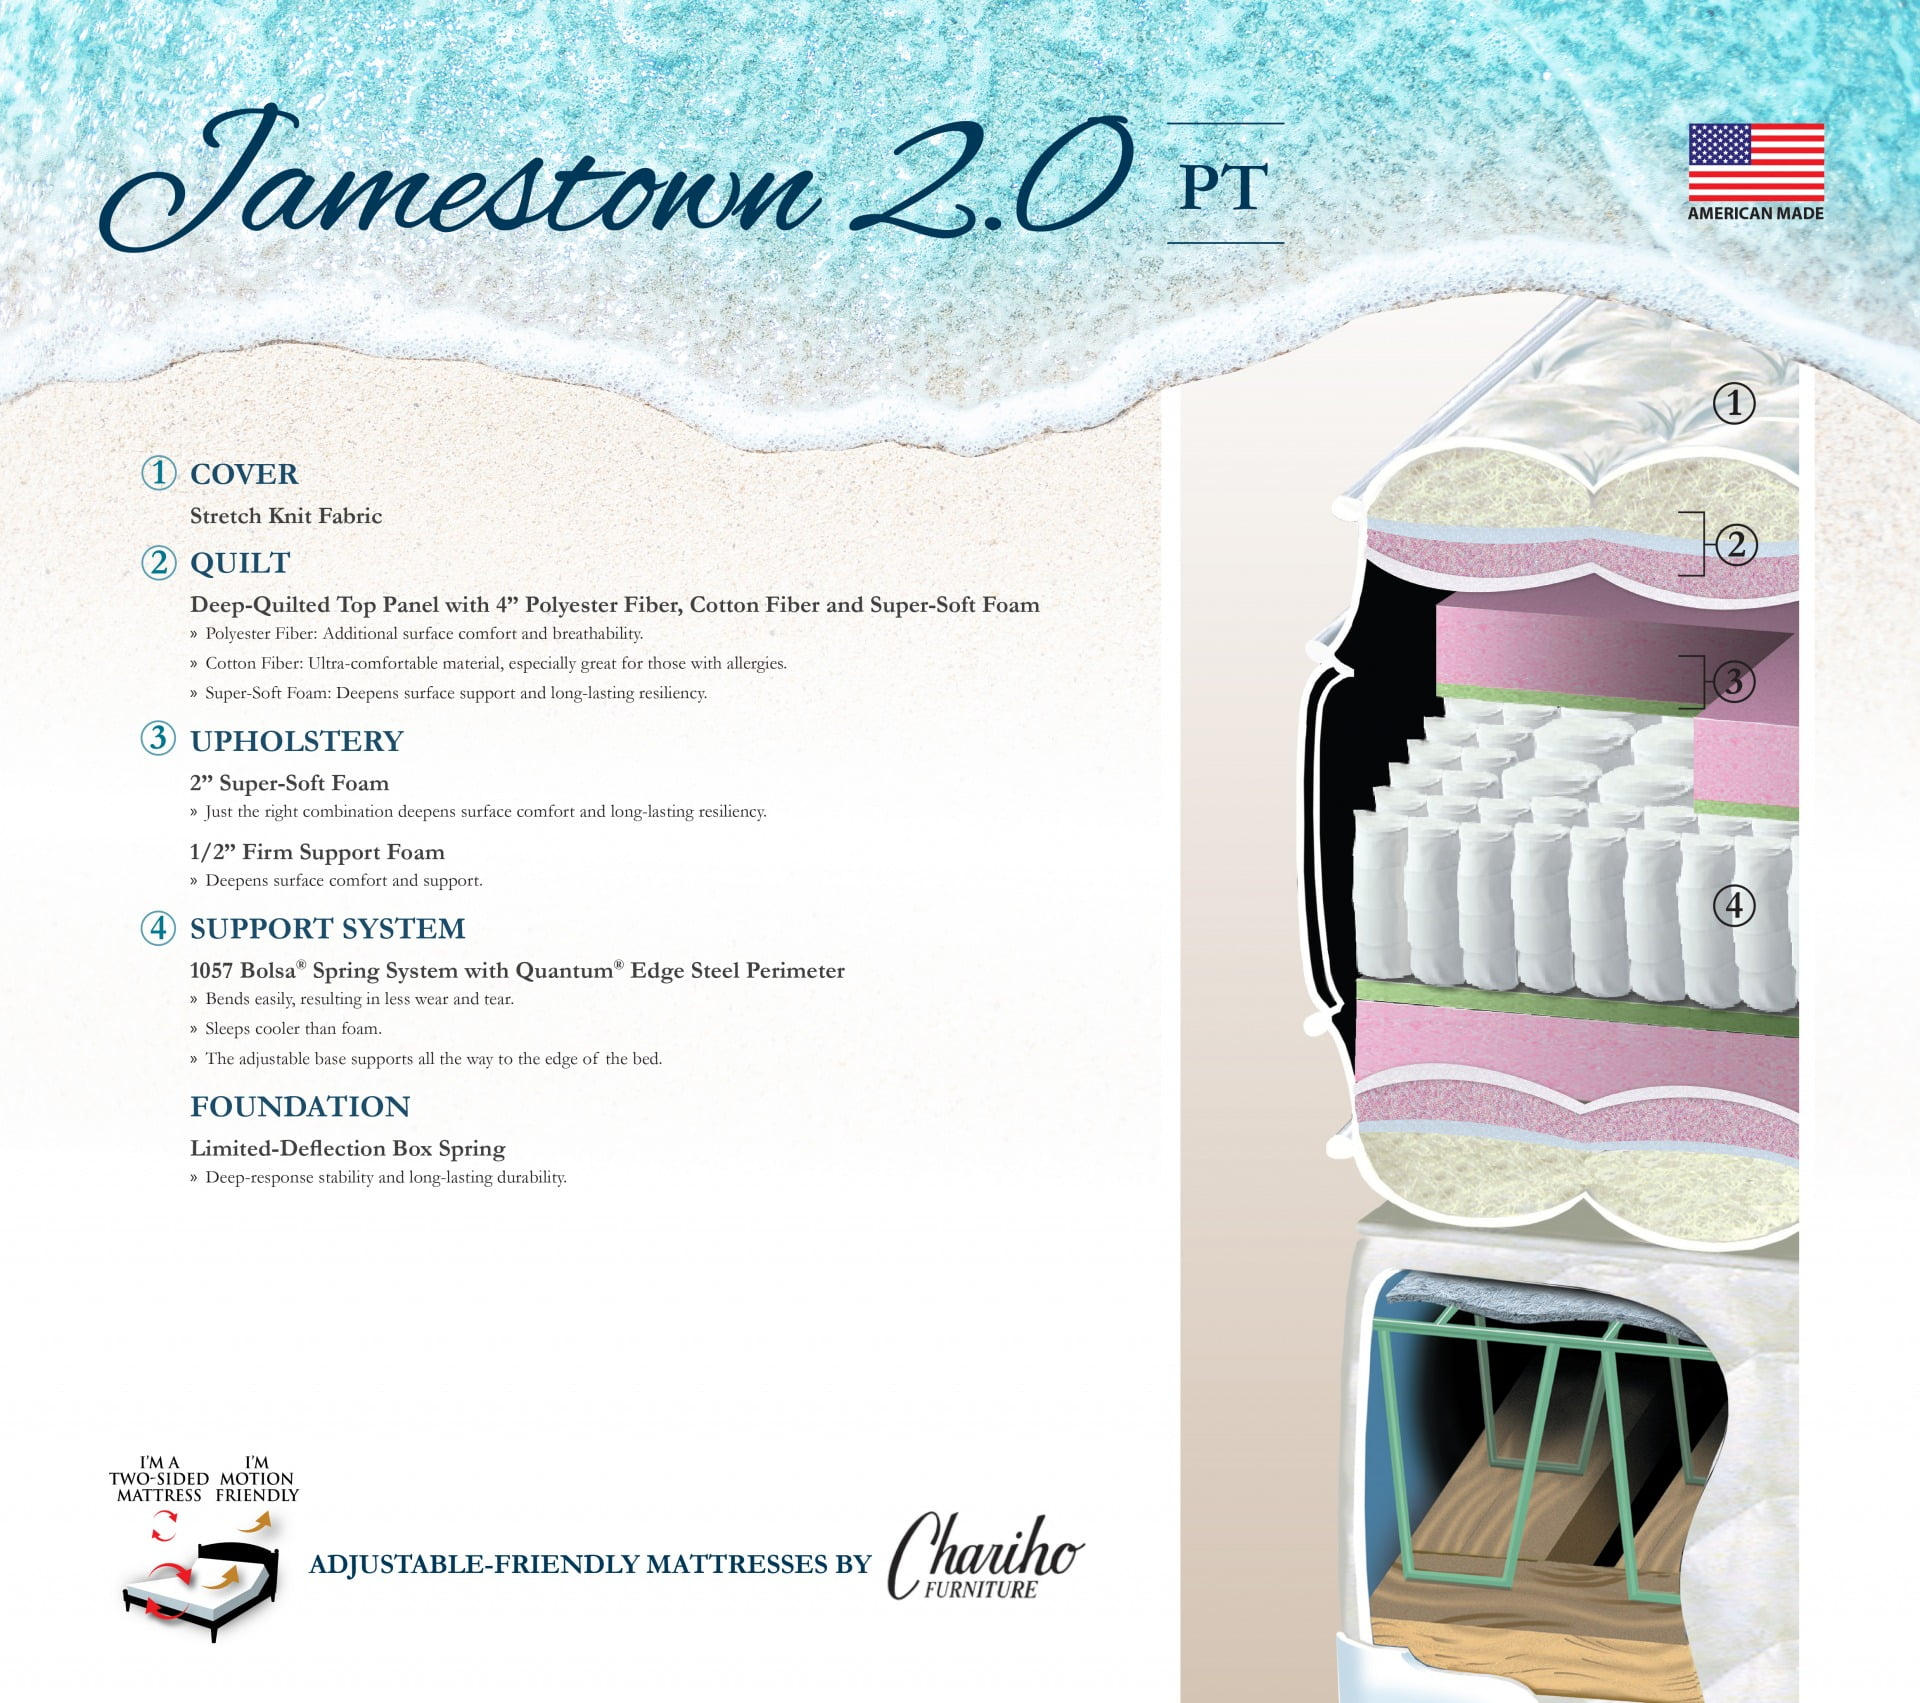 Chariho Furniture AJ Jamestown 2.0 PT Spec Card